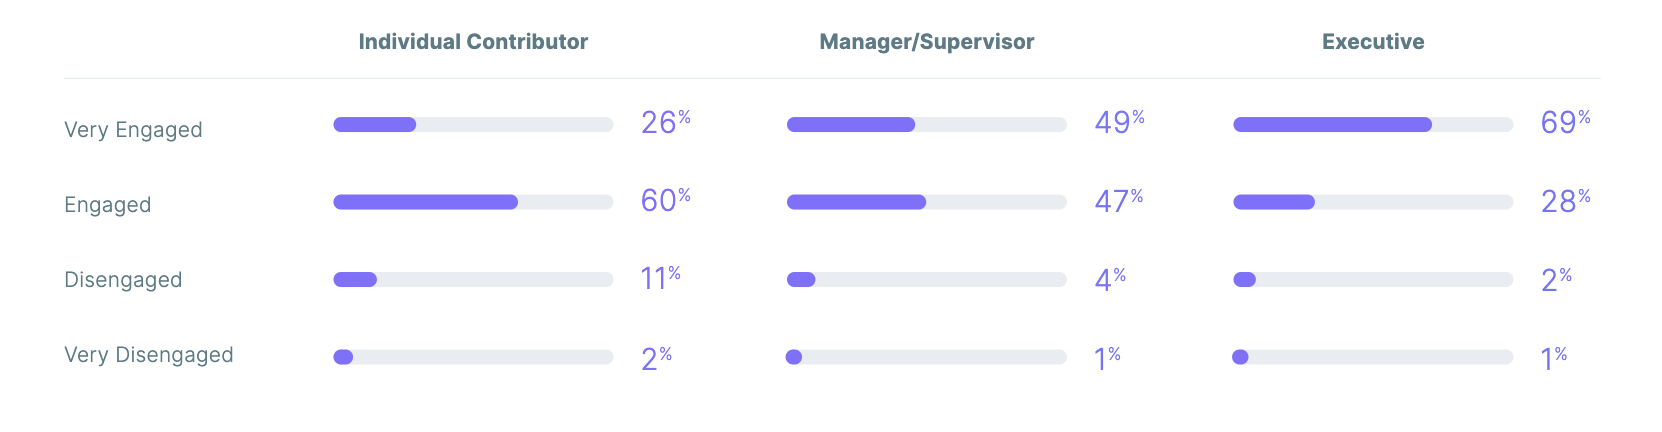 Employee Engagement Survey - The Productivity Gap 2